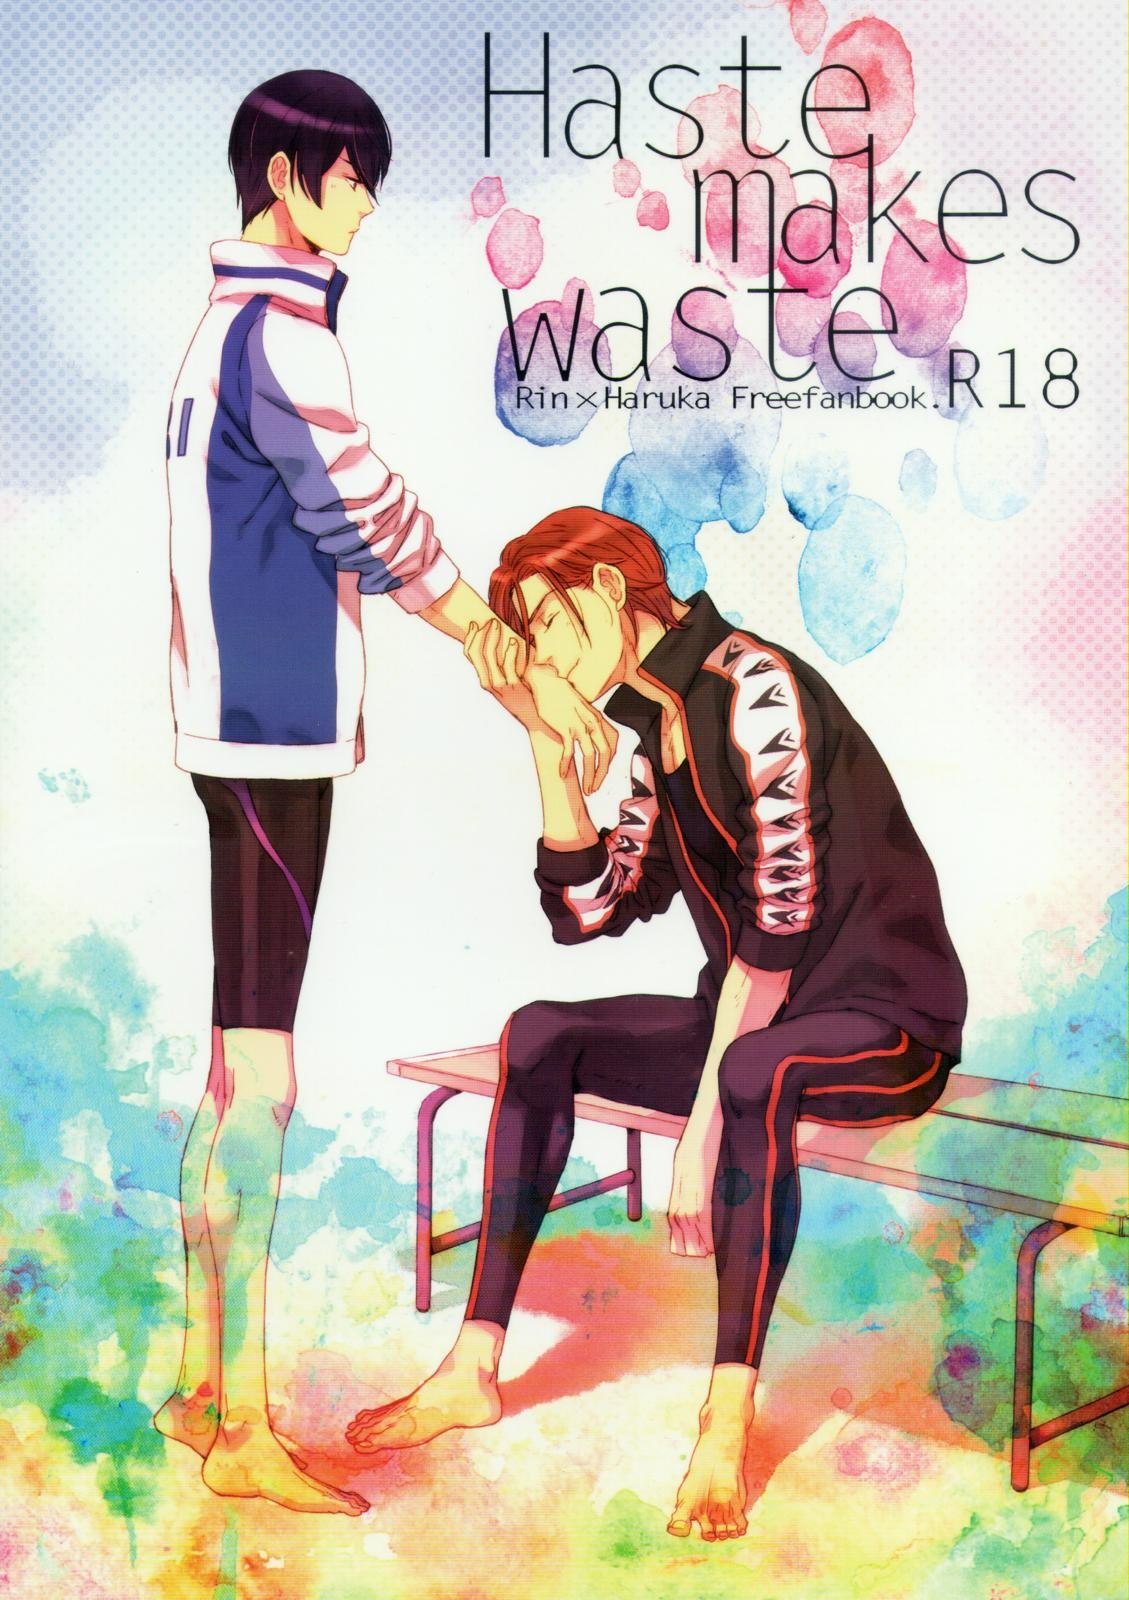 【Free!ボーイズラブ同人誌】凛×遙「Haste makes waste」※アナルセックス【BLエロ漫画18禁】